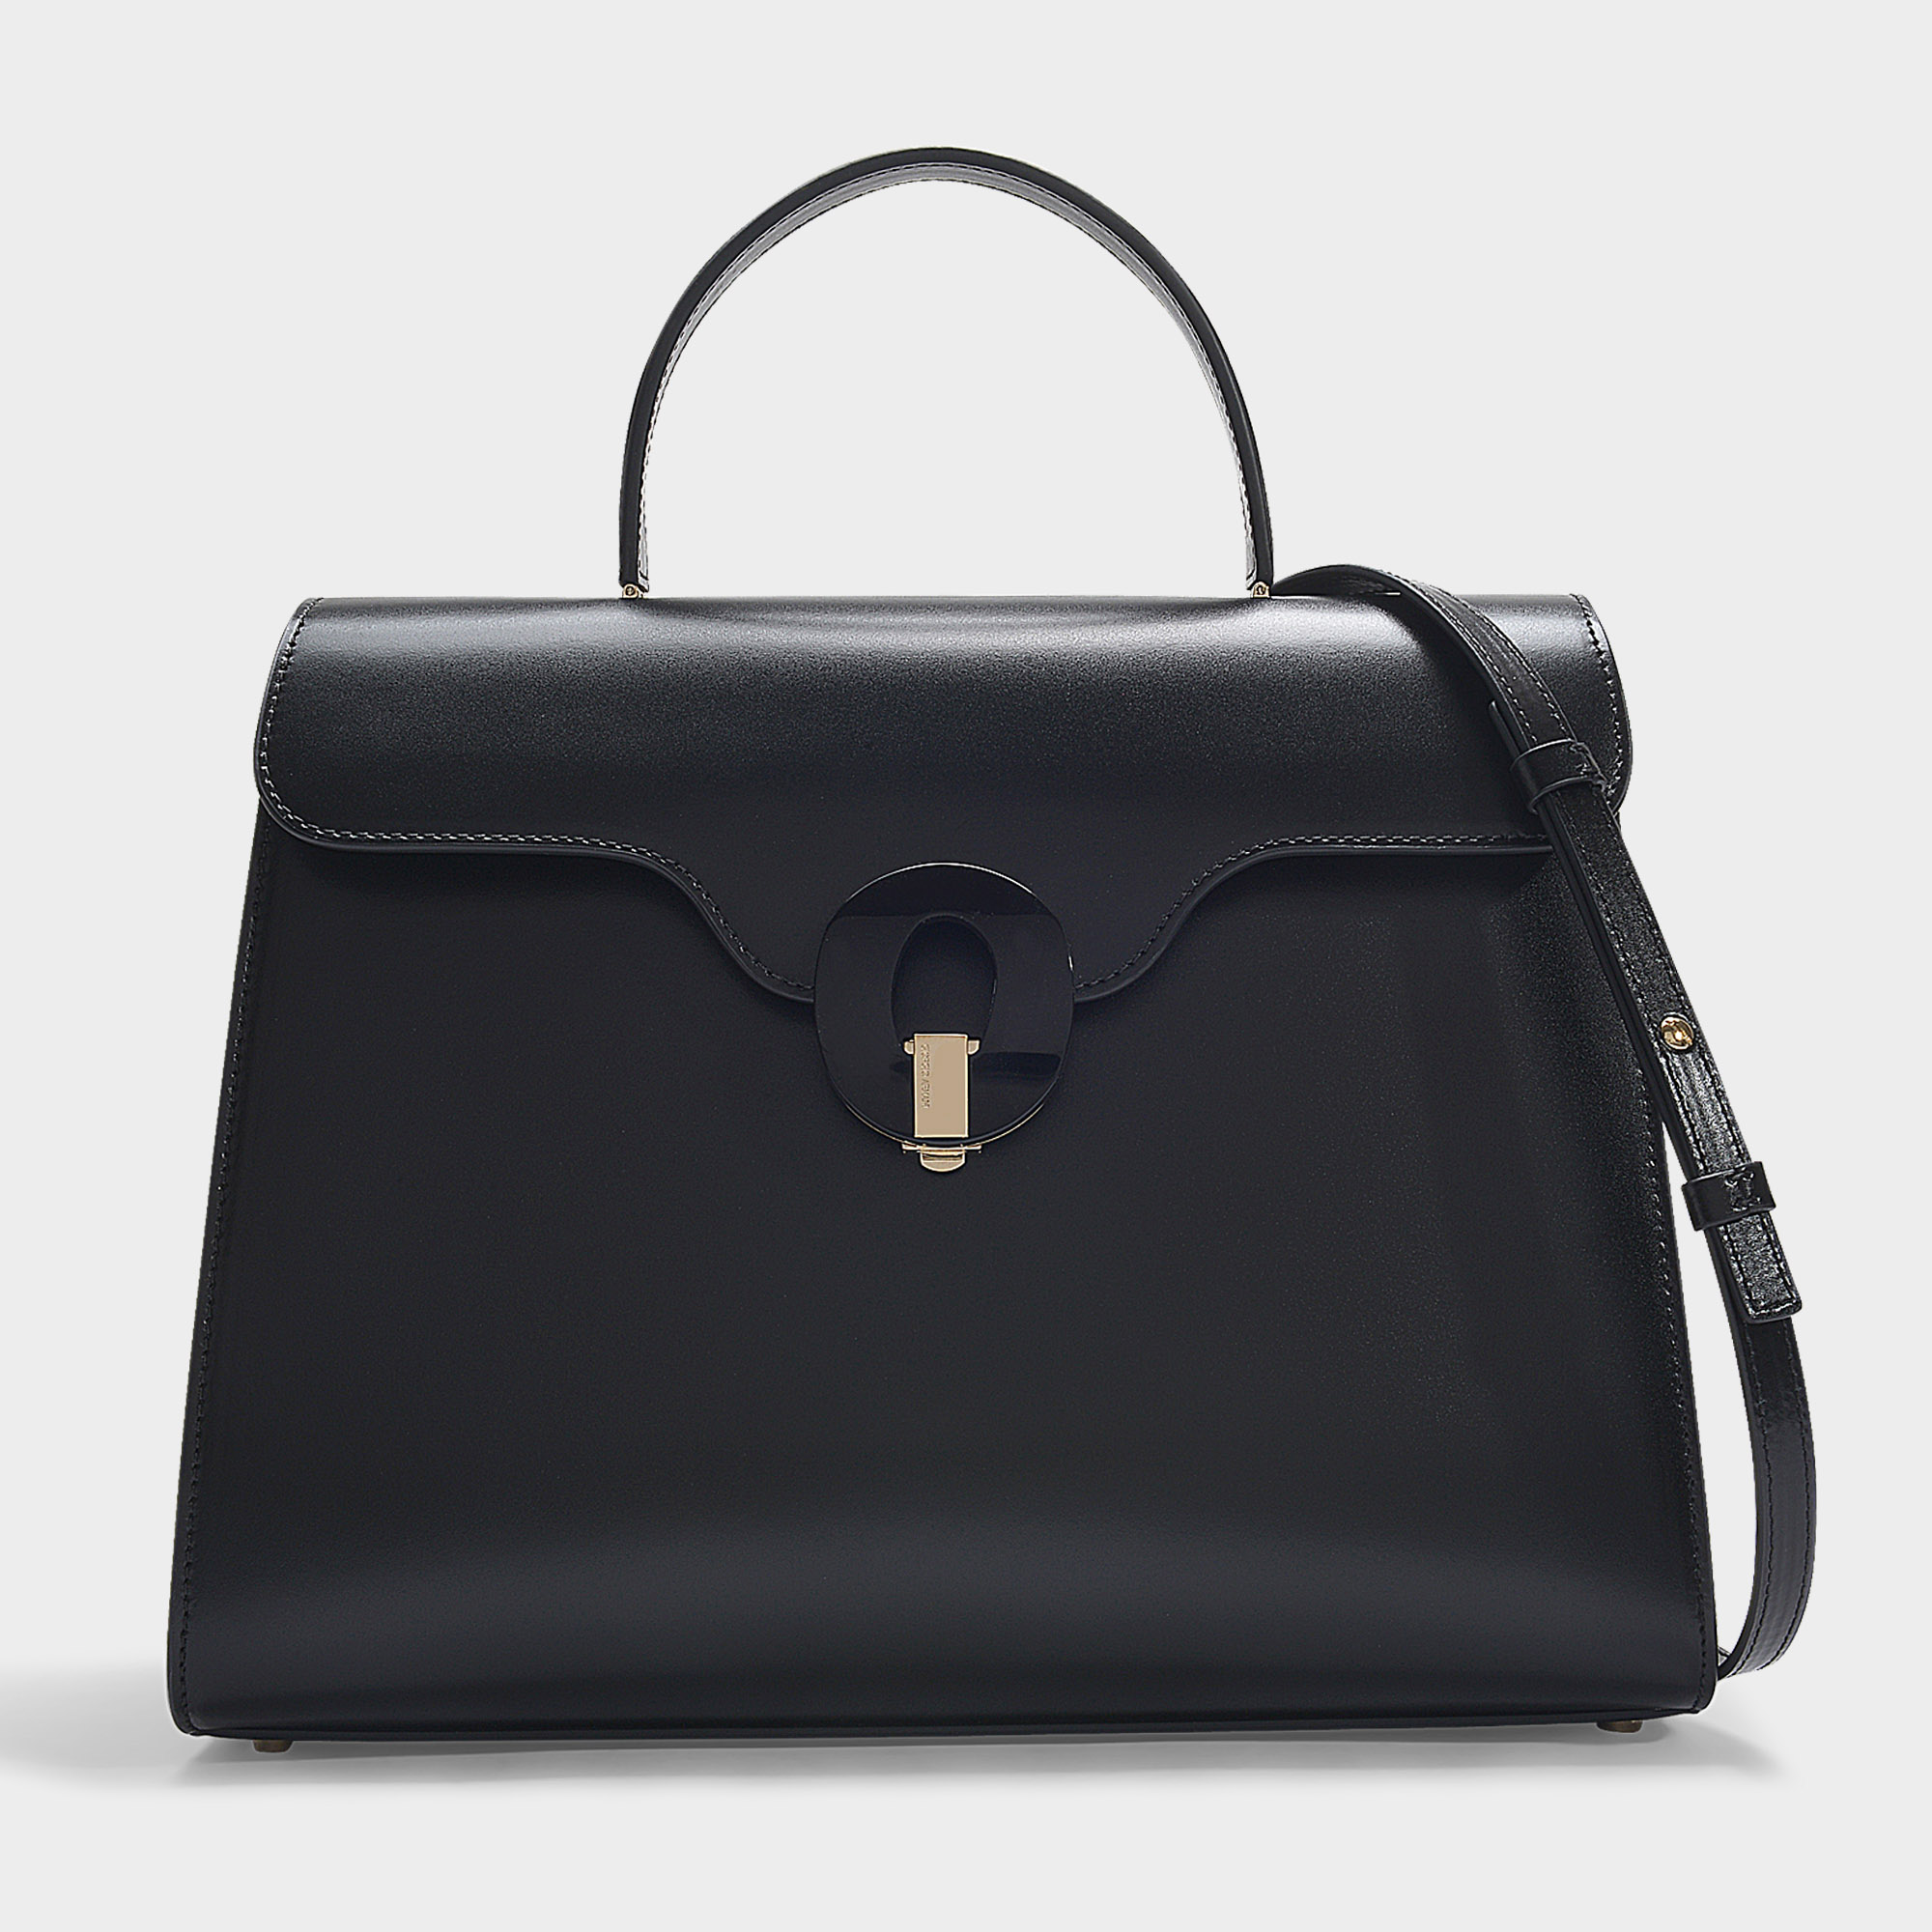 Giorgio Armani | Musa Top Handle Bag In Black Calfskin